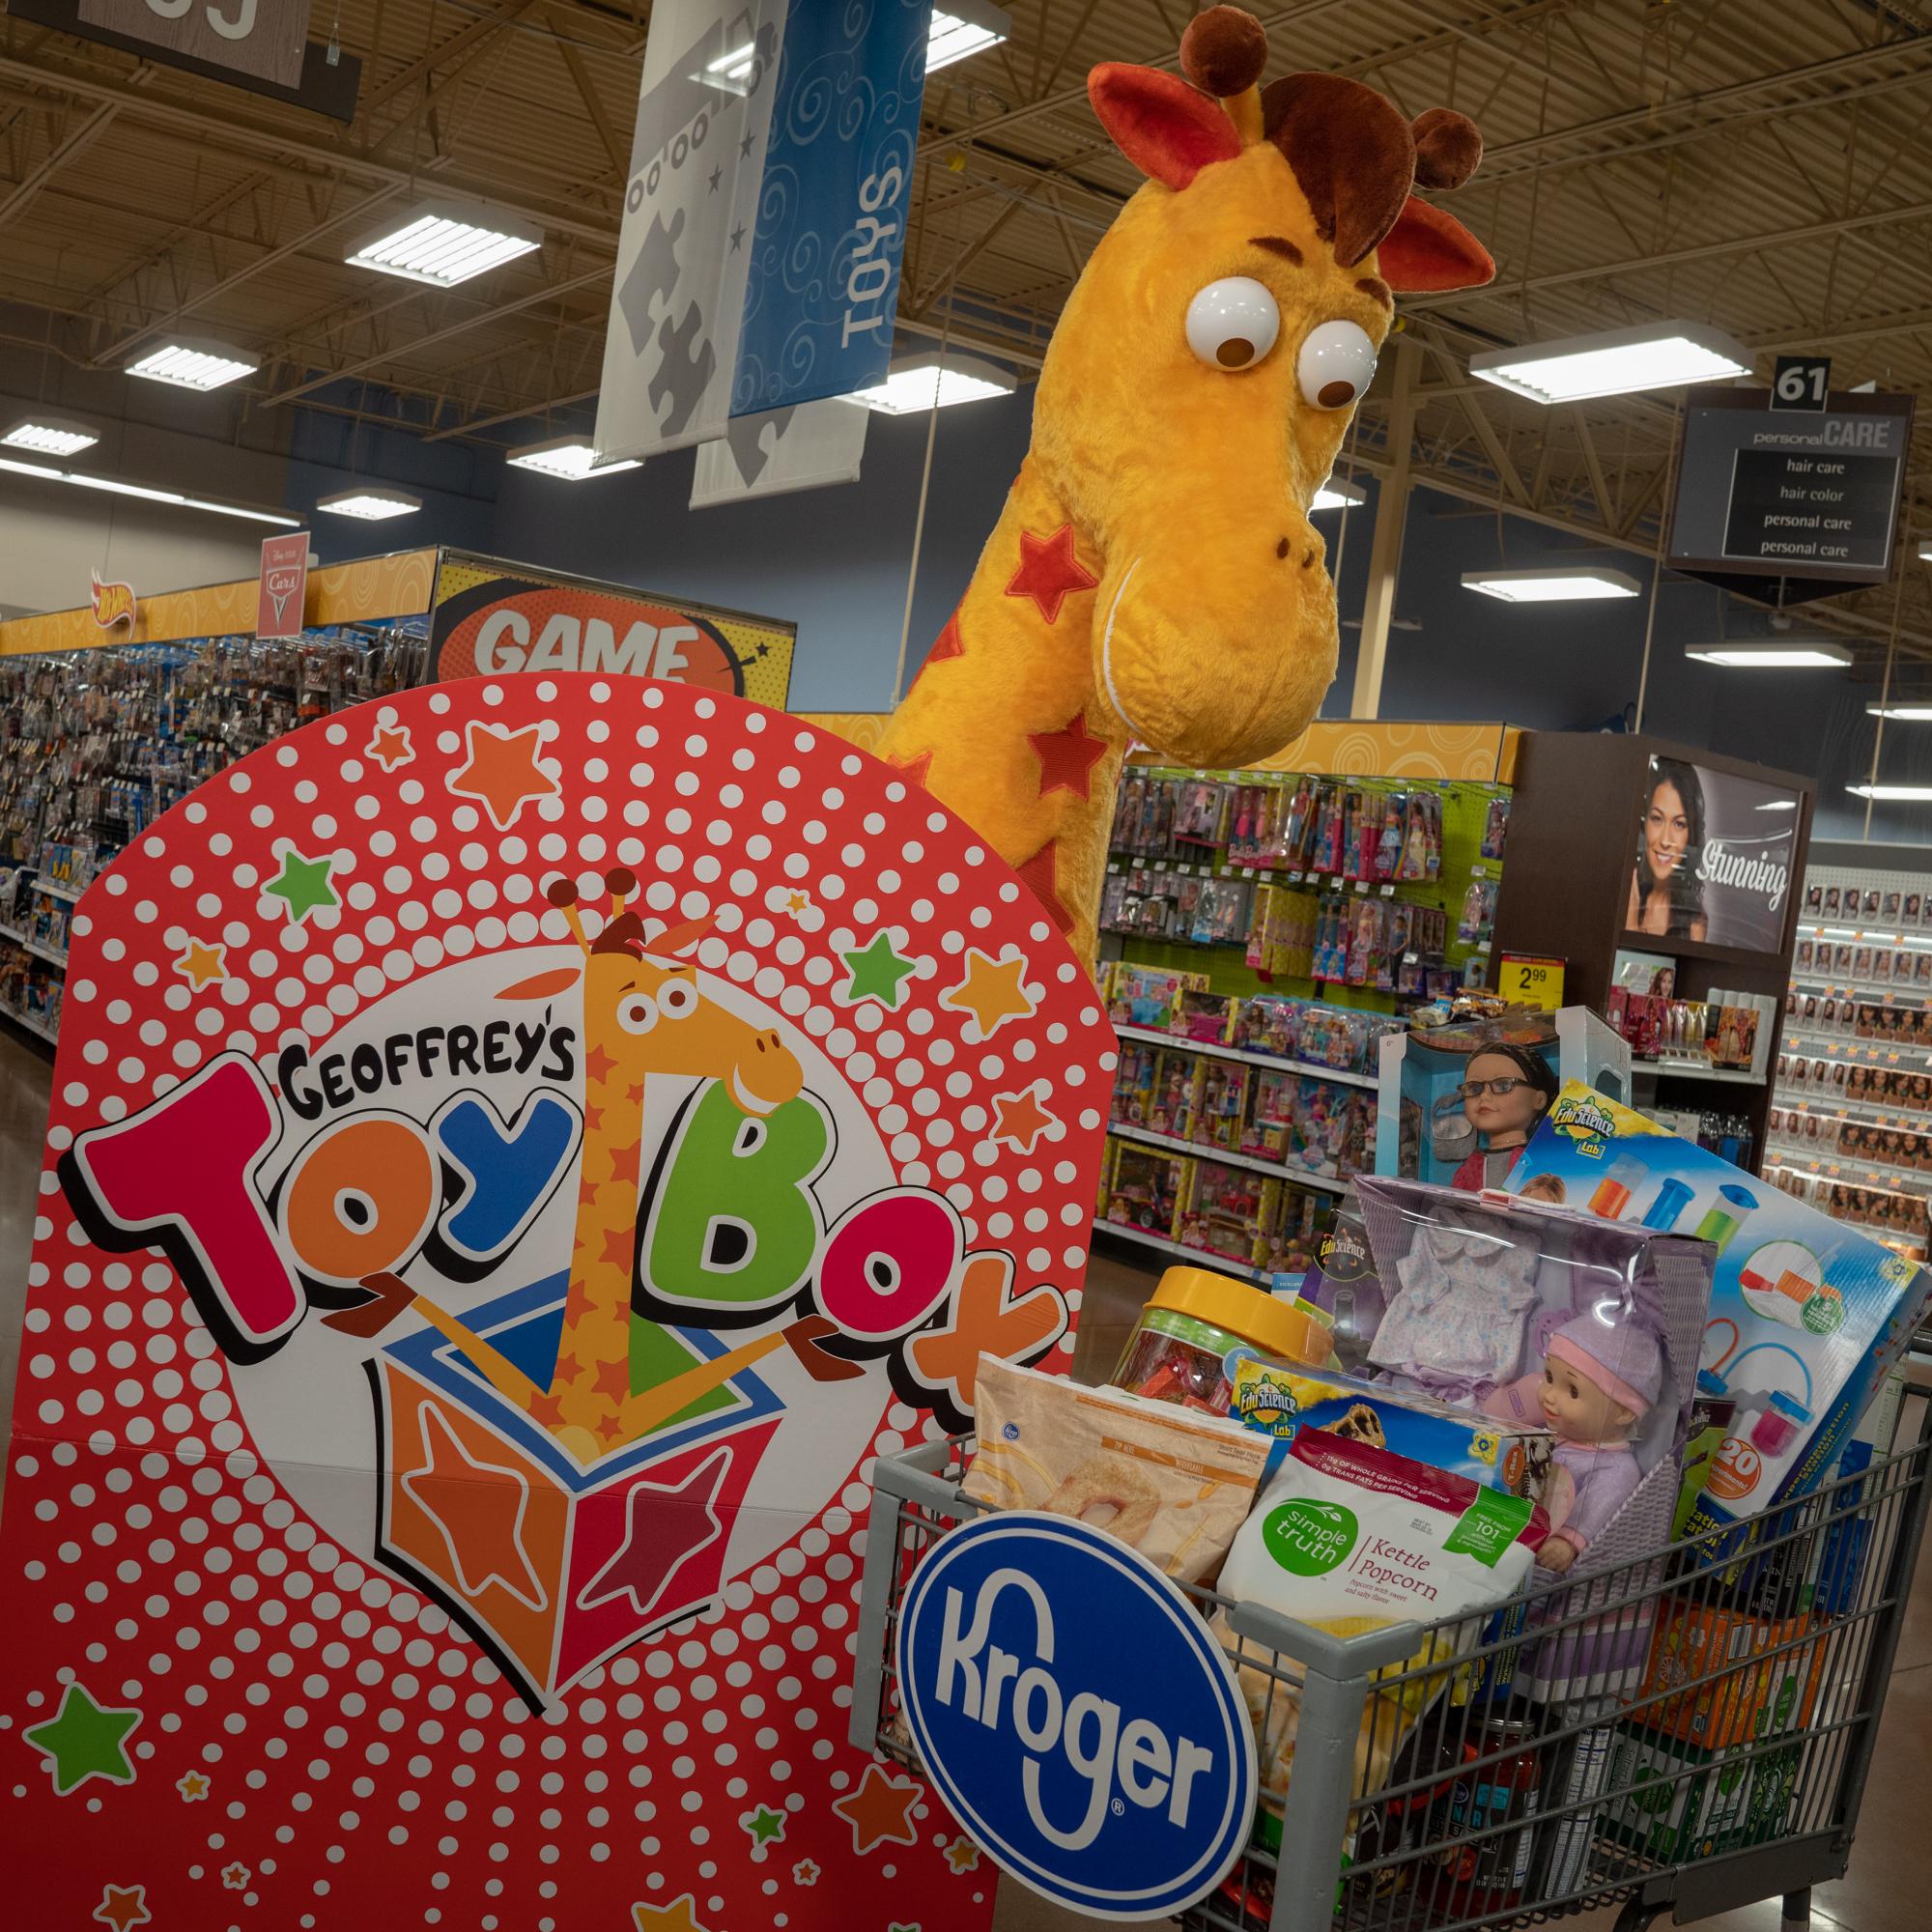 Geoffrey's toy box kroger